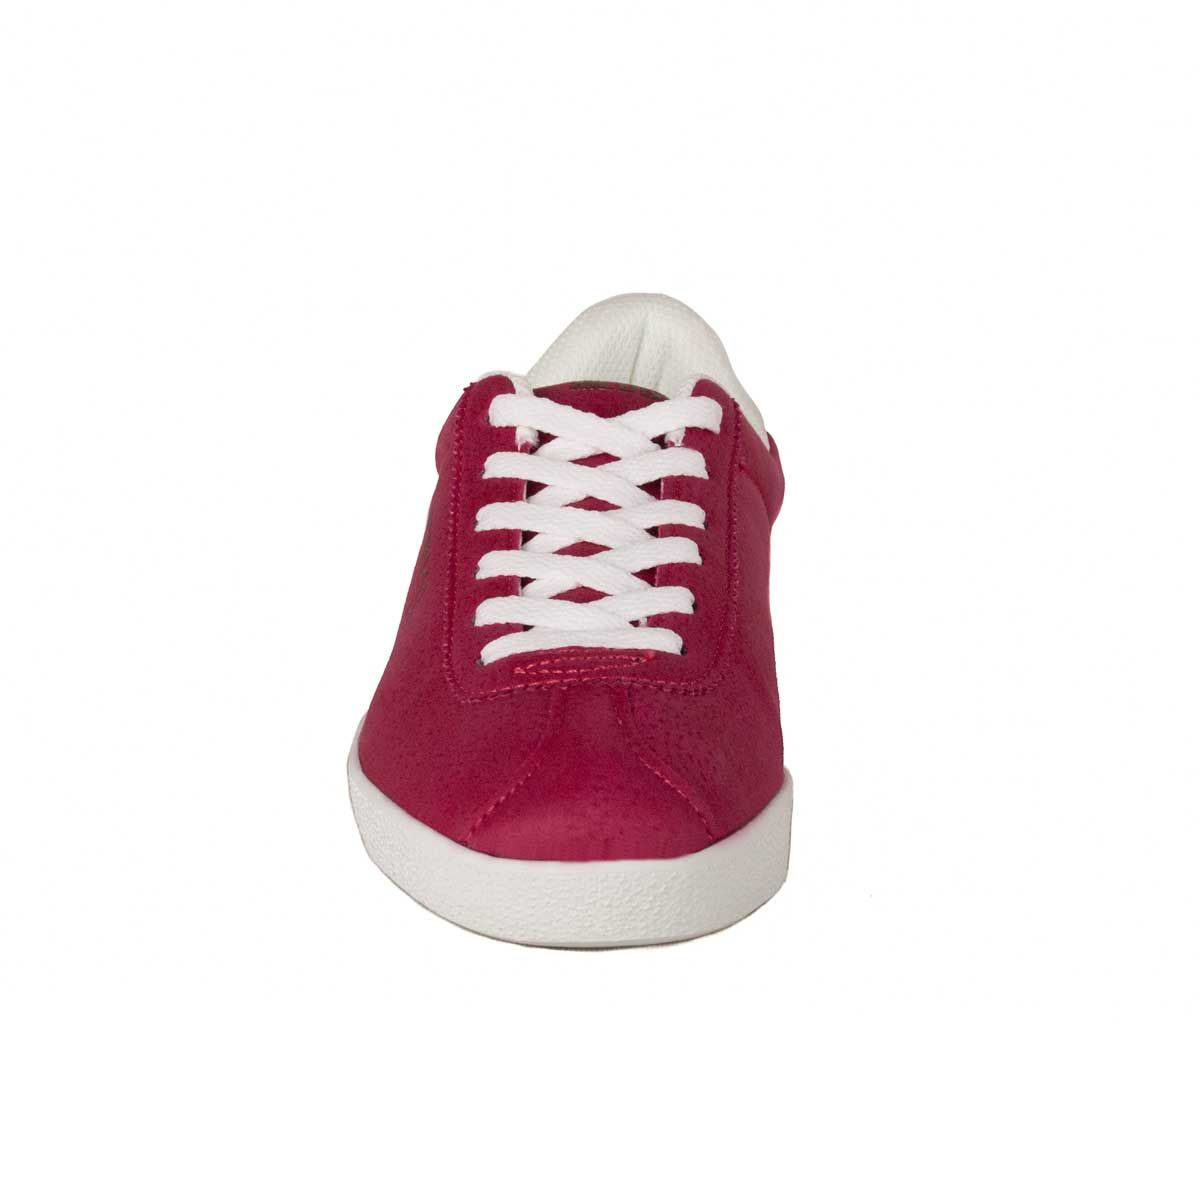 Montevita Comfortable Sneaker in Pink